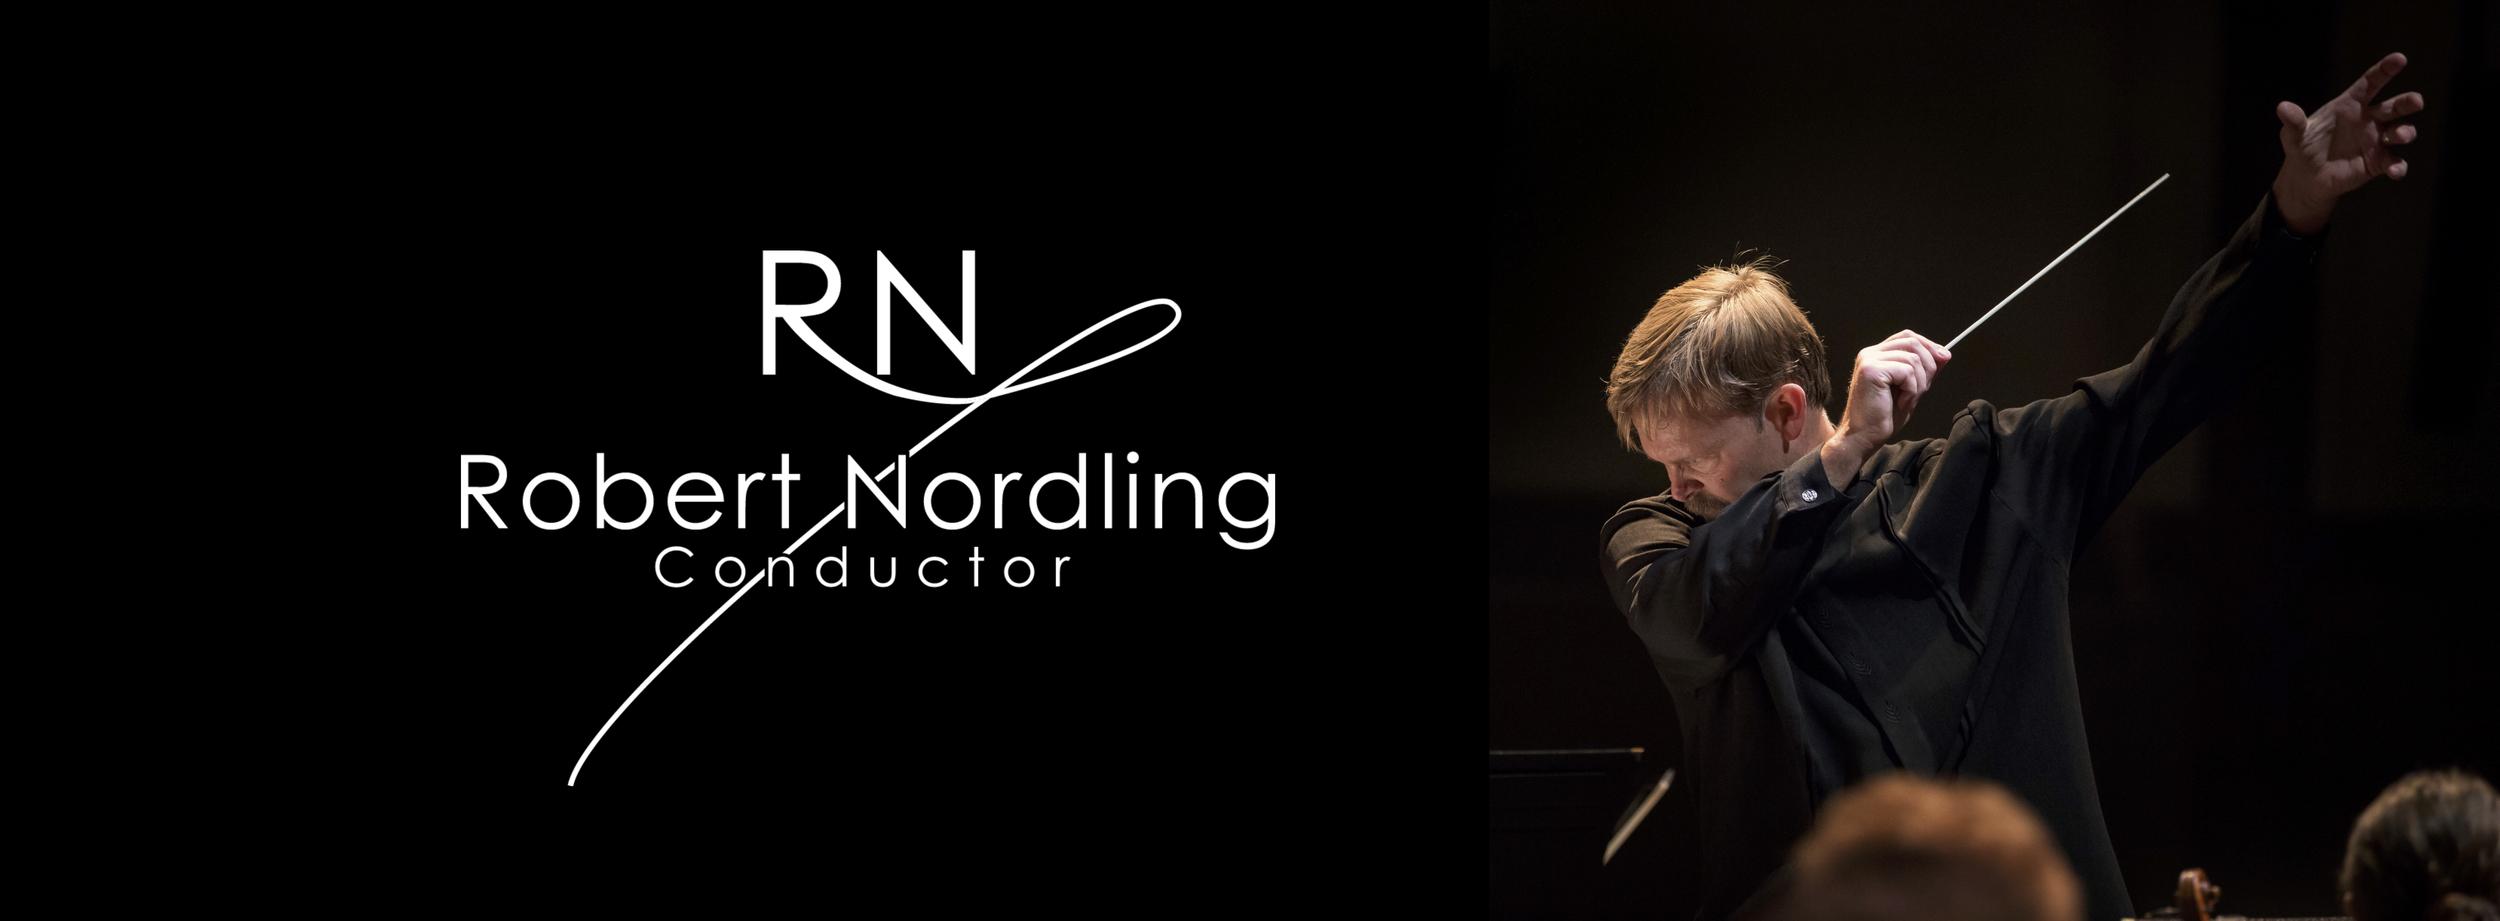 Robert Nordling - Header.jpg